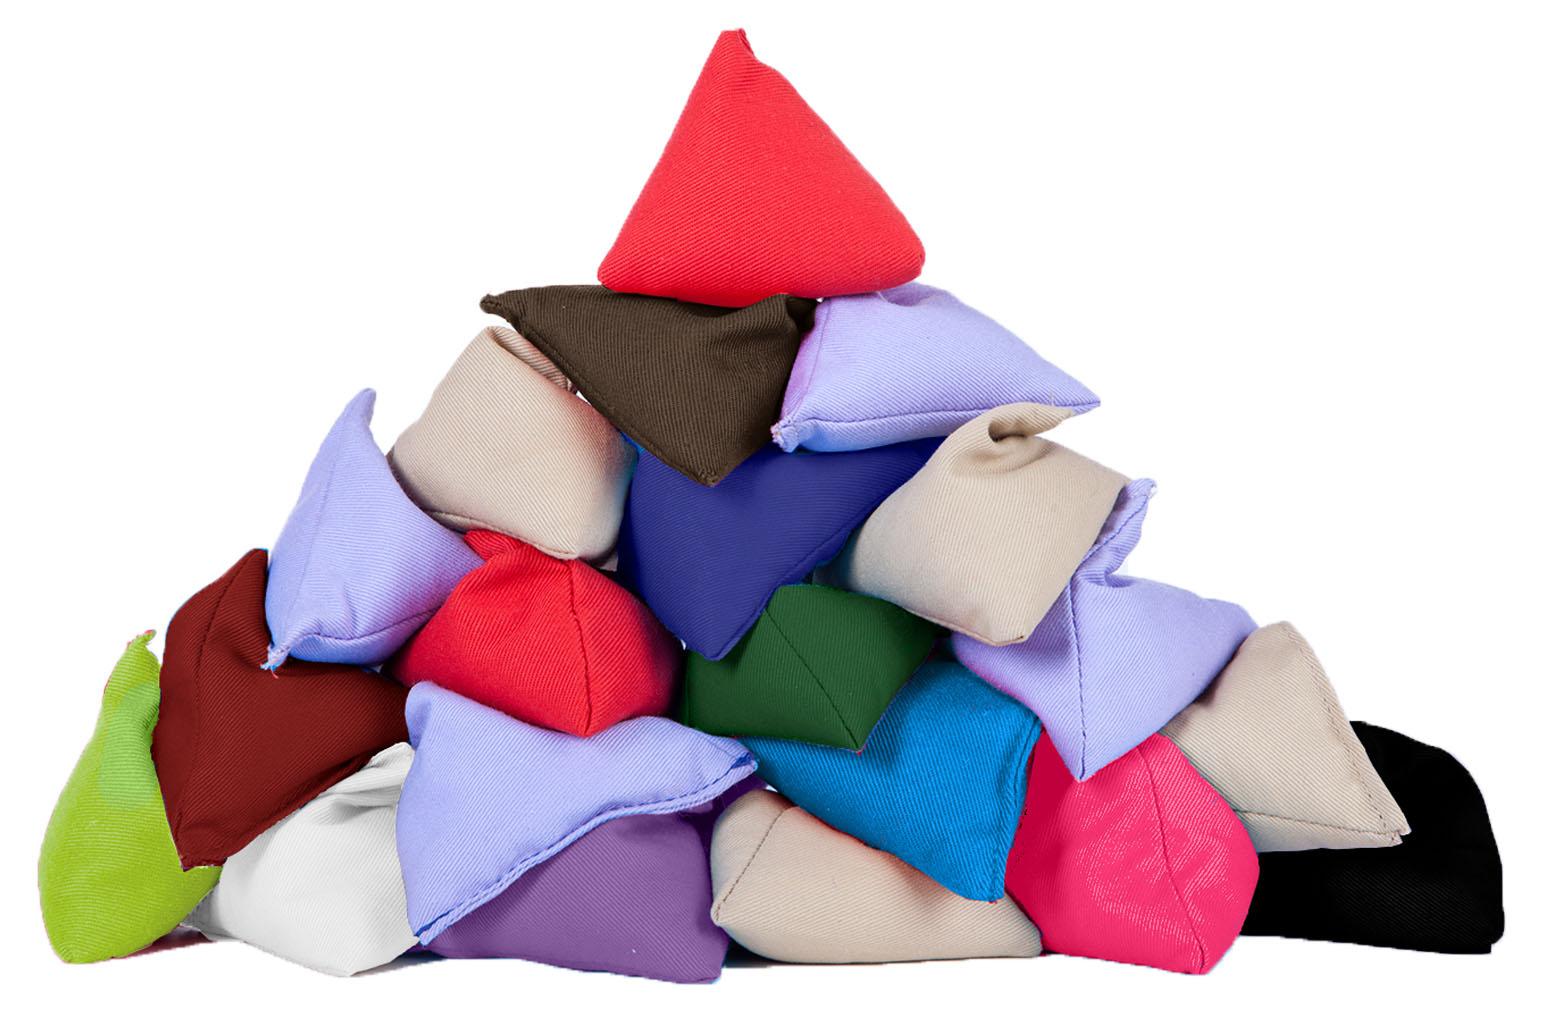 Multipacks Juggling Pyramid Bean Bags Practice Throwing Catching Triangular  PE - Multipacks Juggling Pyramid Bean Bags Practice Throwing Catching